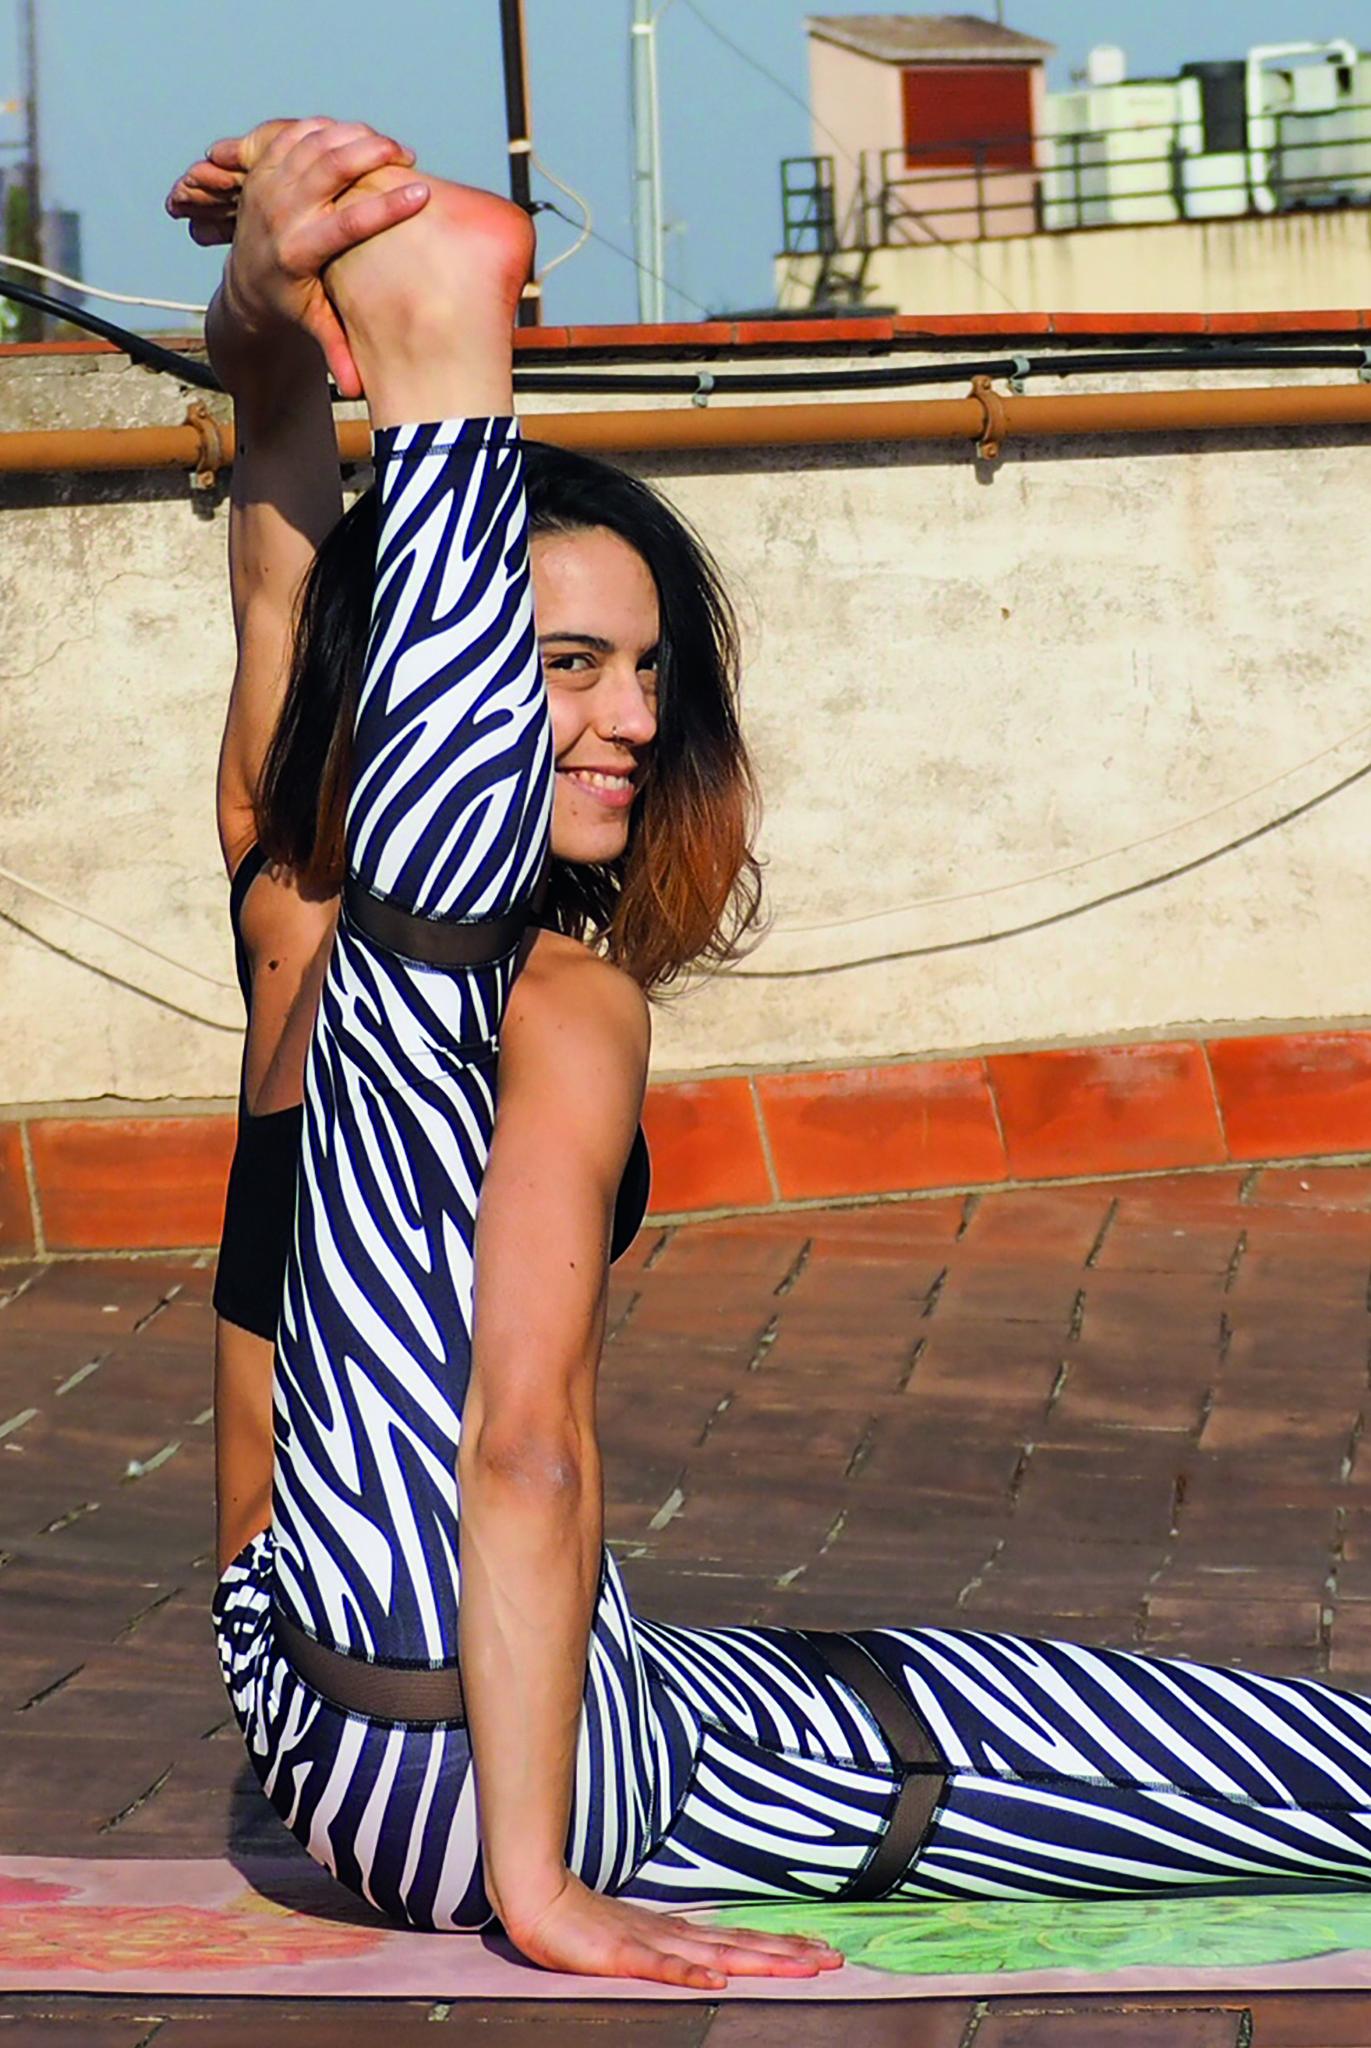 Africa Dream Zebra Print Leggings, £39.99 blossomyogawear.com